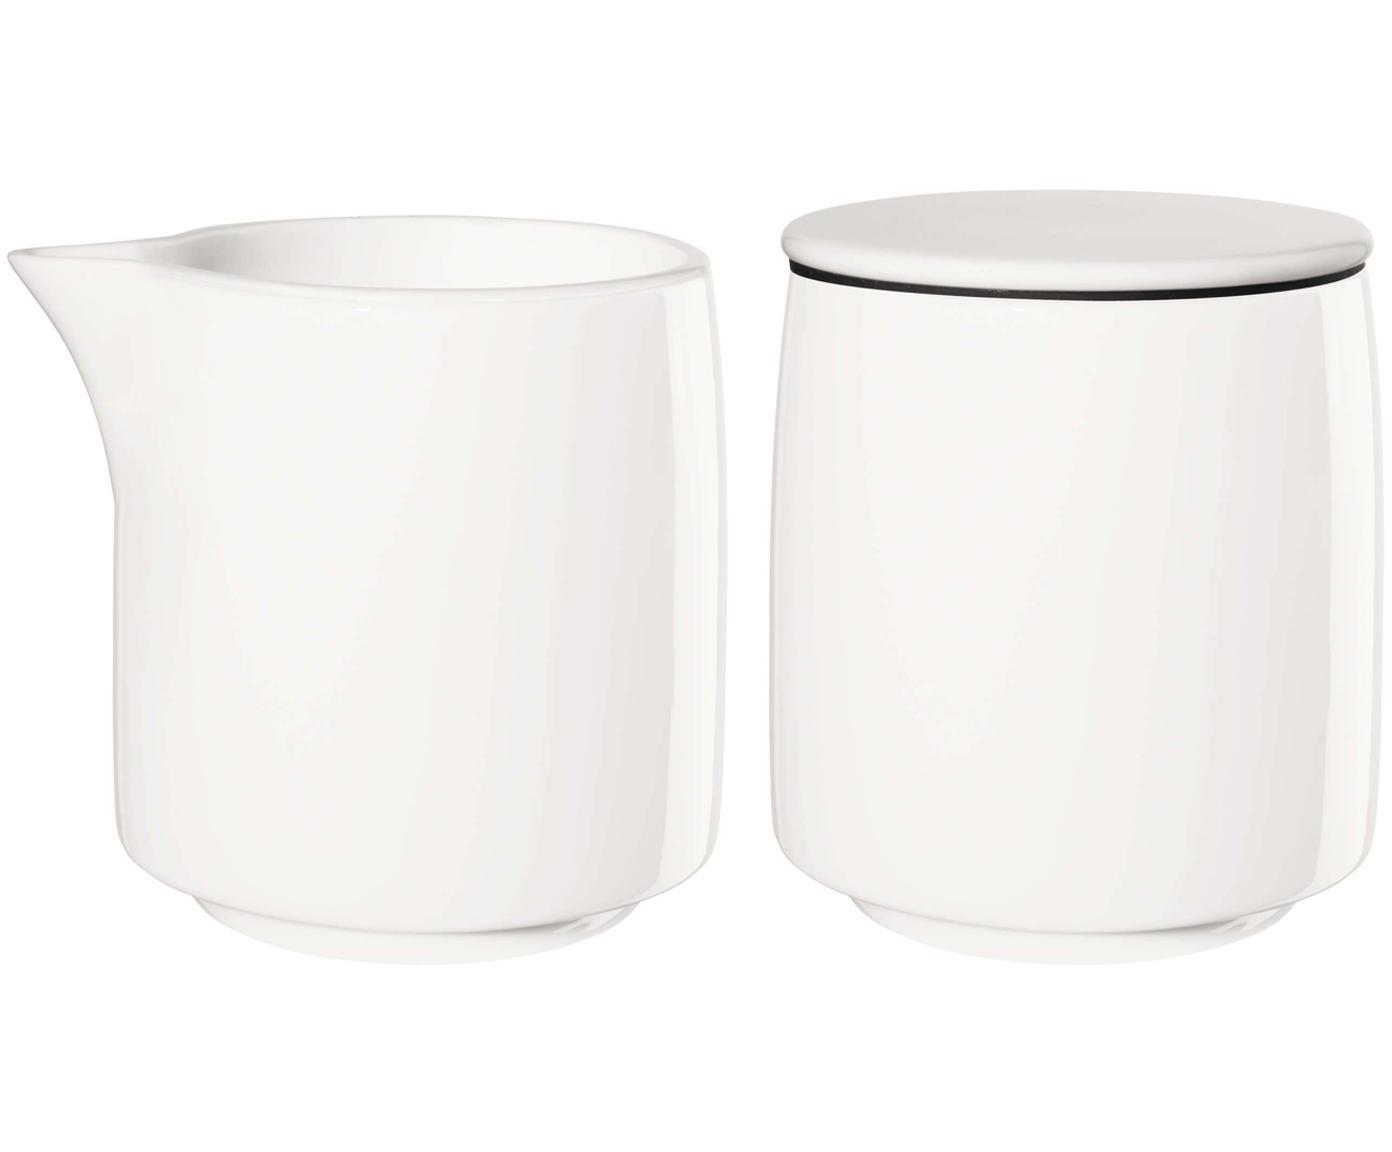 Set latte e zucchero Safe 2 pz, Porcellana, Bianco, nero, Ø 8 x Alt. 8 cm